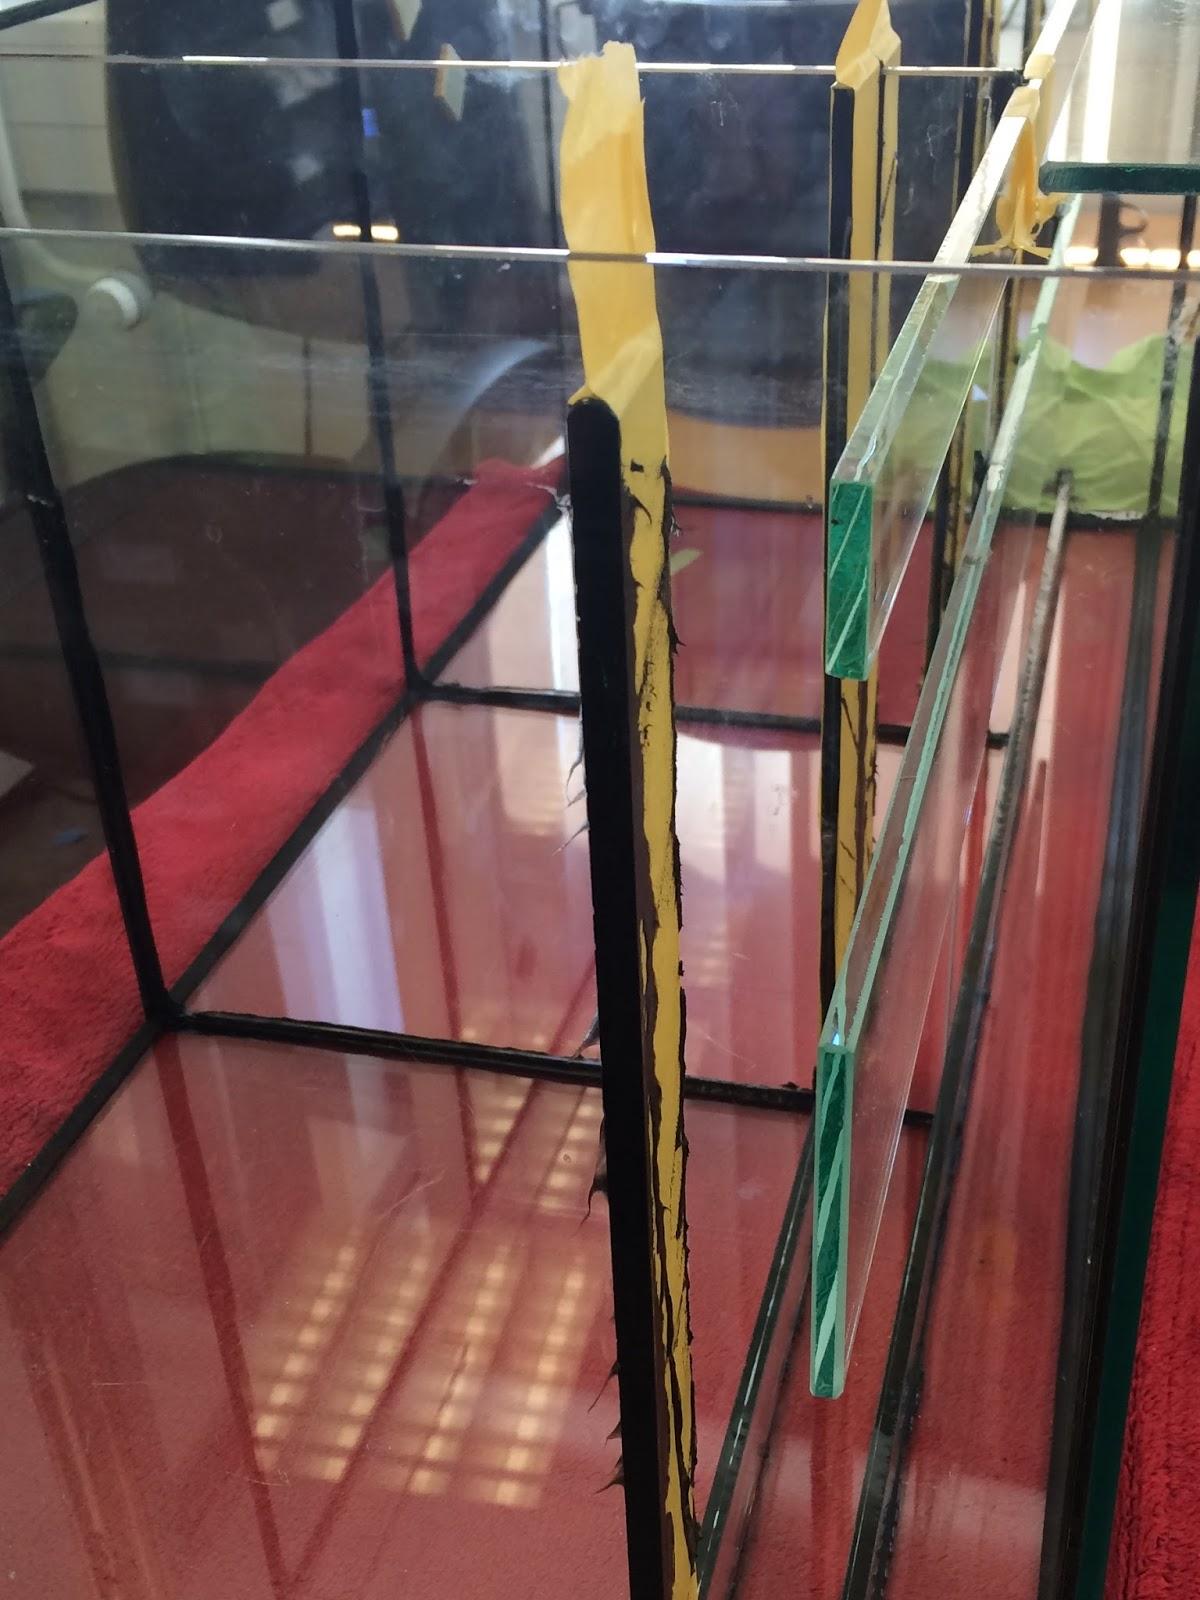 silikon von glas entfernen aquarium – zuhause image ideas